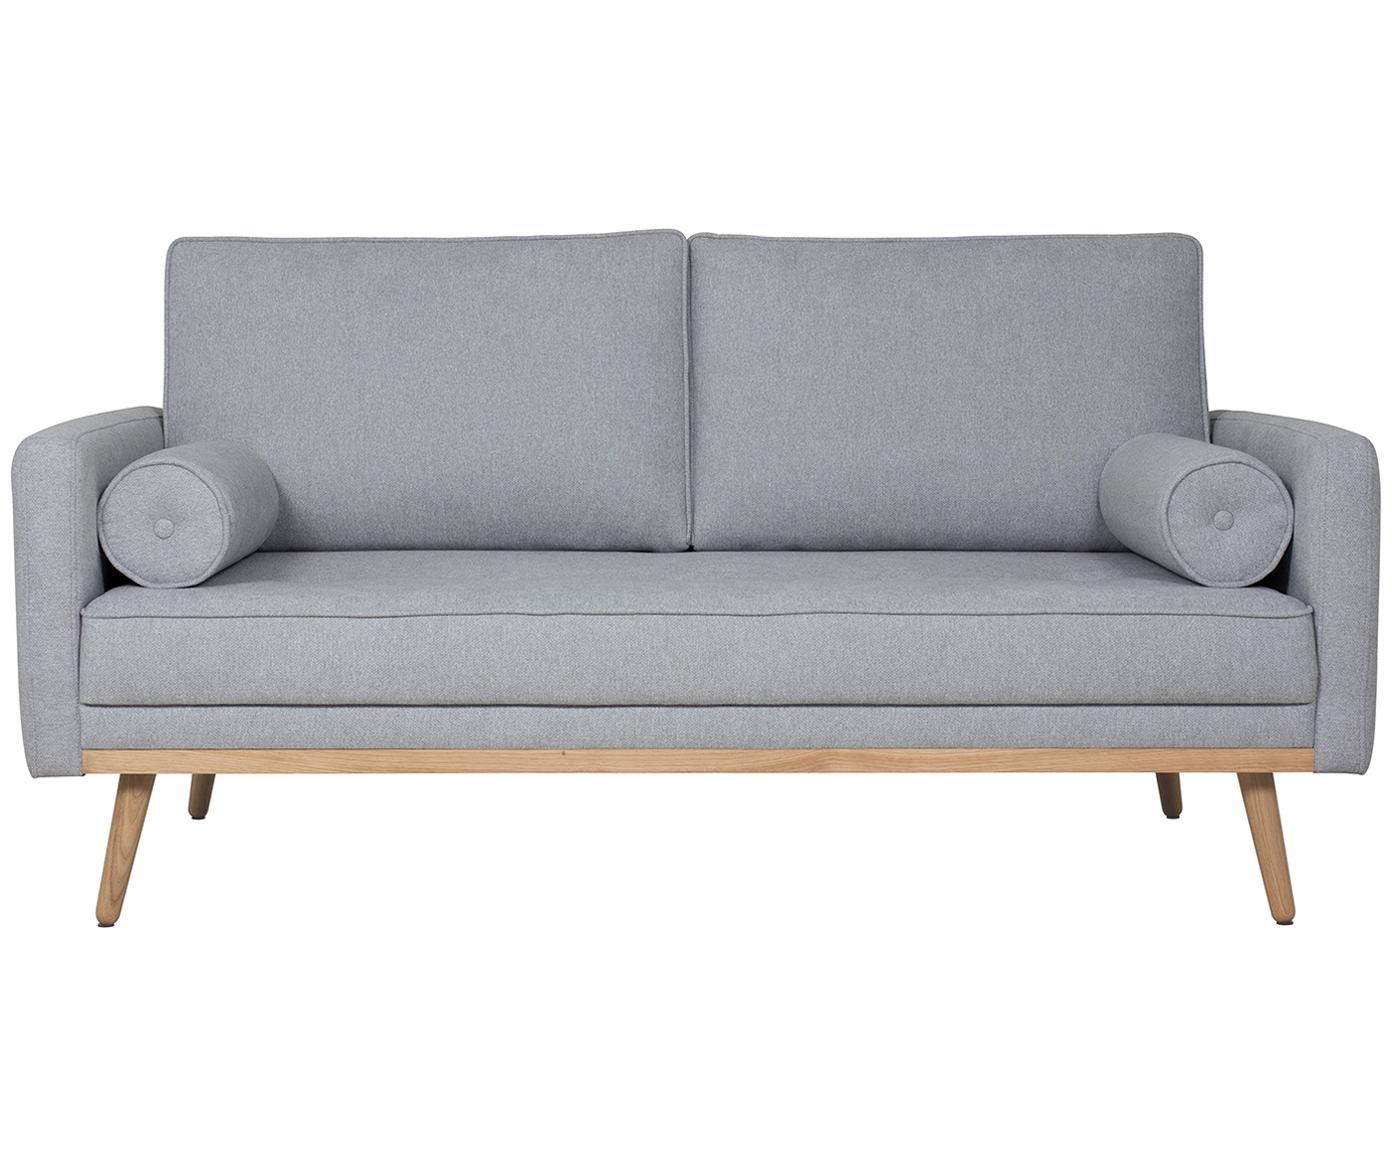 Sofa Saint (2-Sitzer), Bezug: Polyester 50.000 Scheuert, Gestell: Massives Kiefernholz, Spa, Webstoff Blaugrau, B 169 x T 93 cm